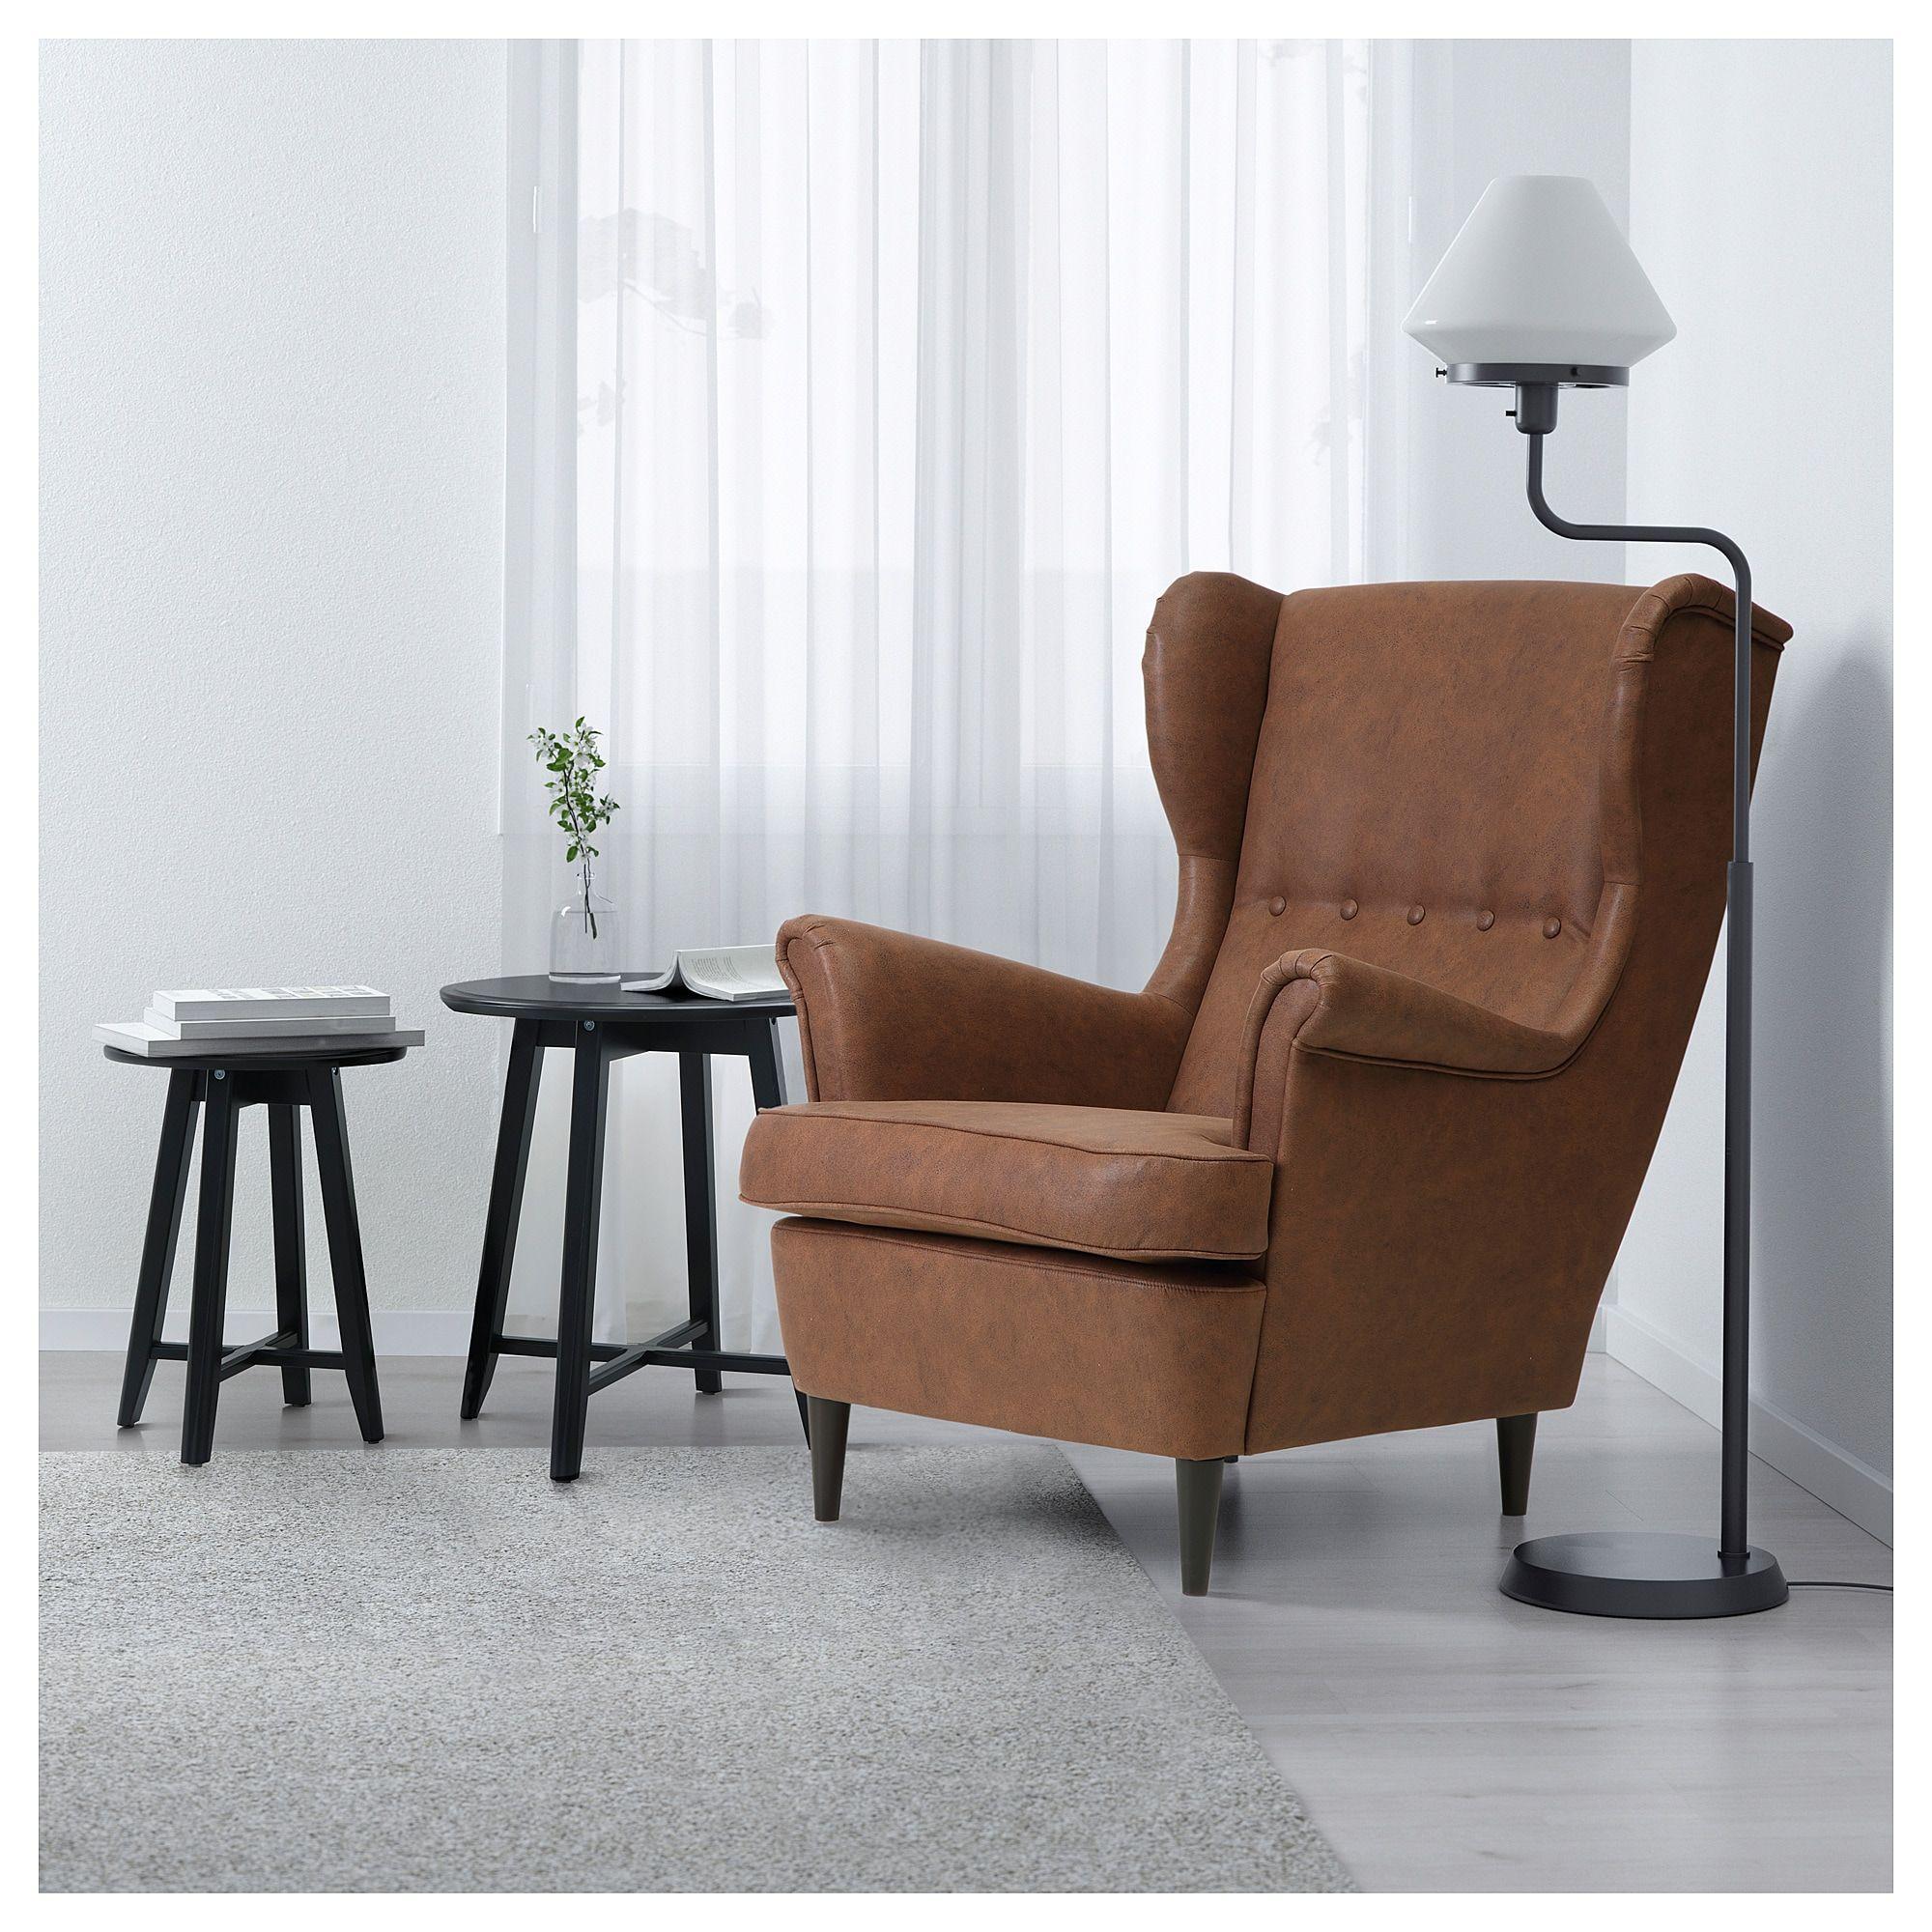 STRANDMON Wing chair Järstad brown Home decor, White